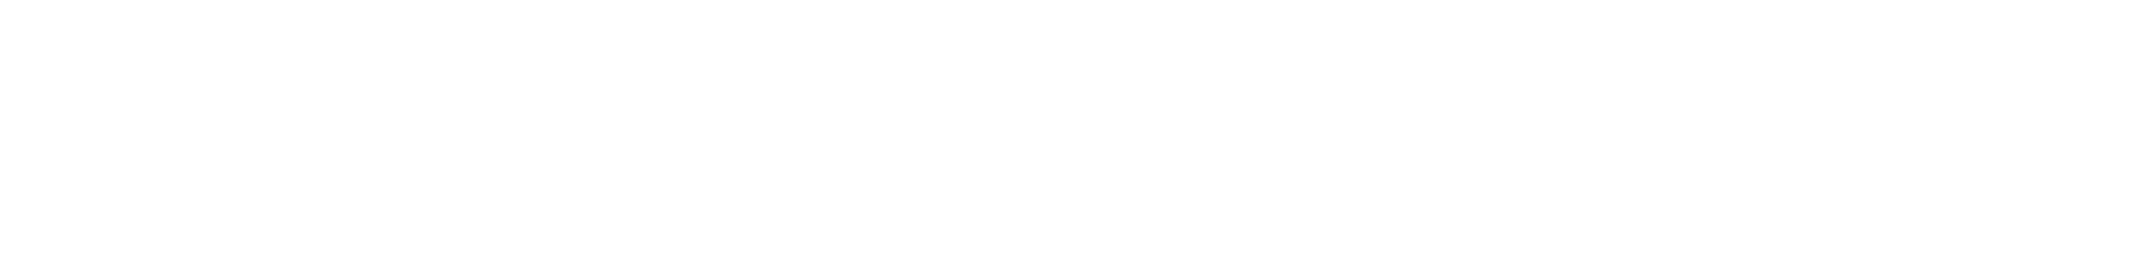 learning-scoop-logo_valk